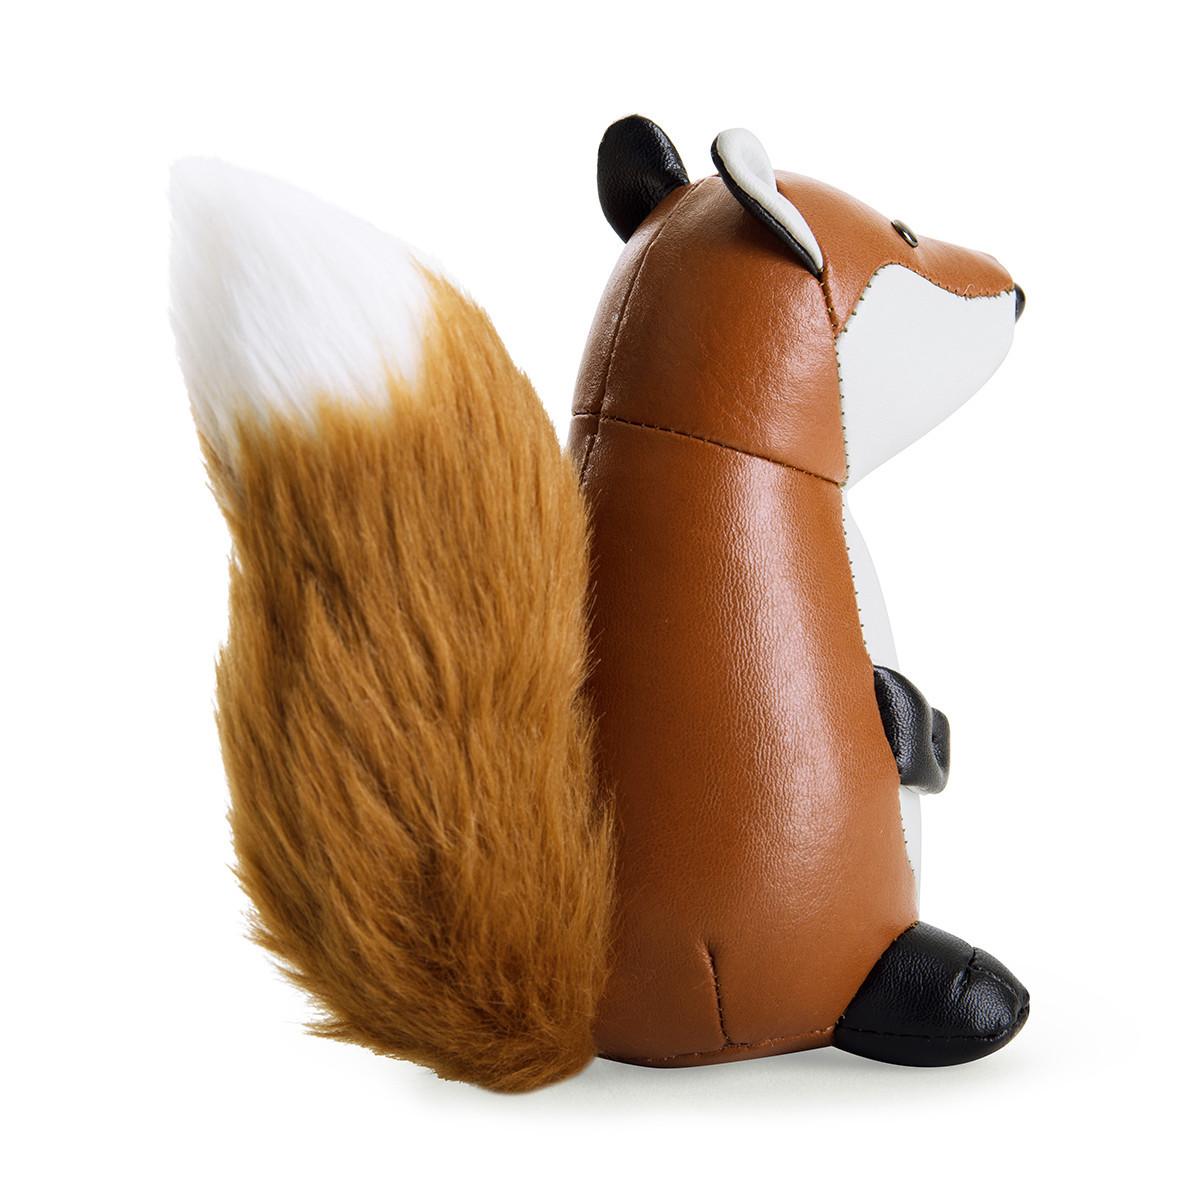 Zuny Paperweight - Classic Fox Tan image